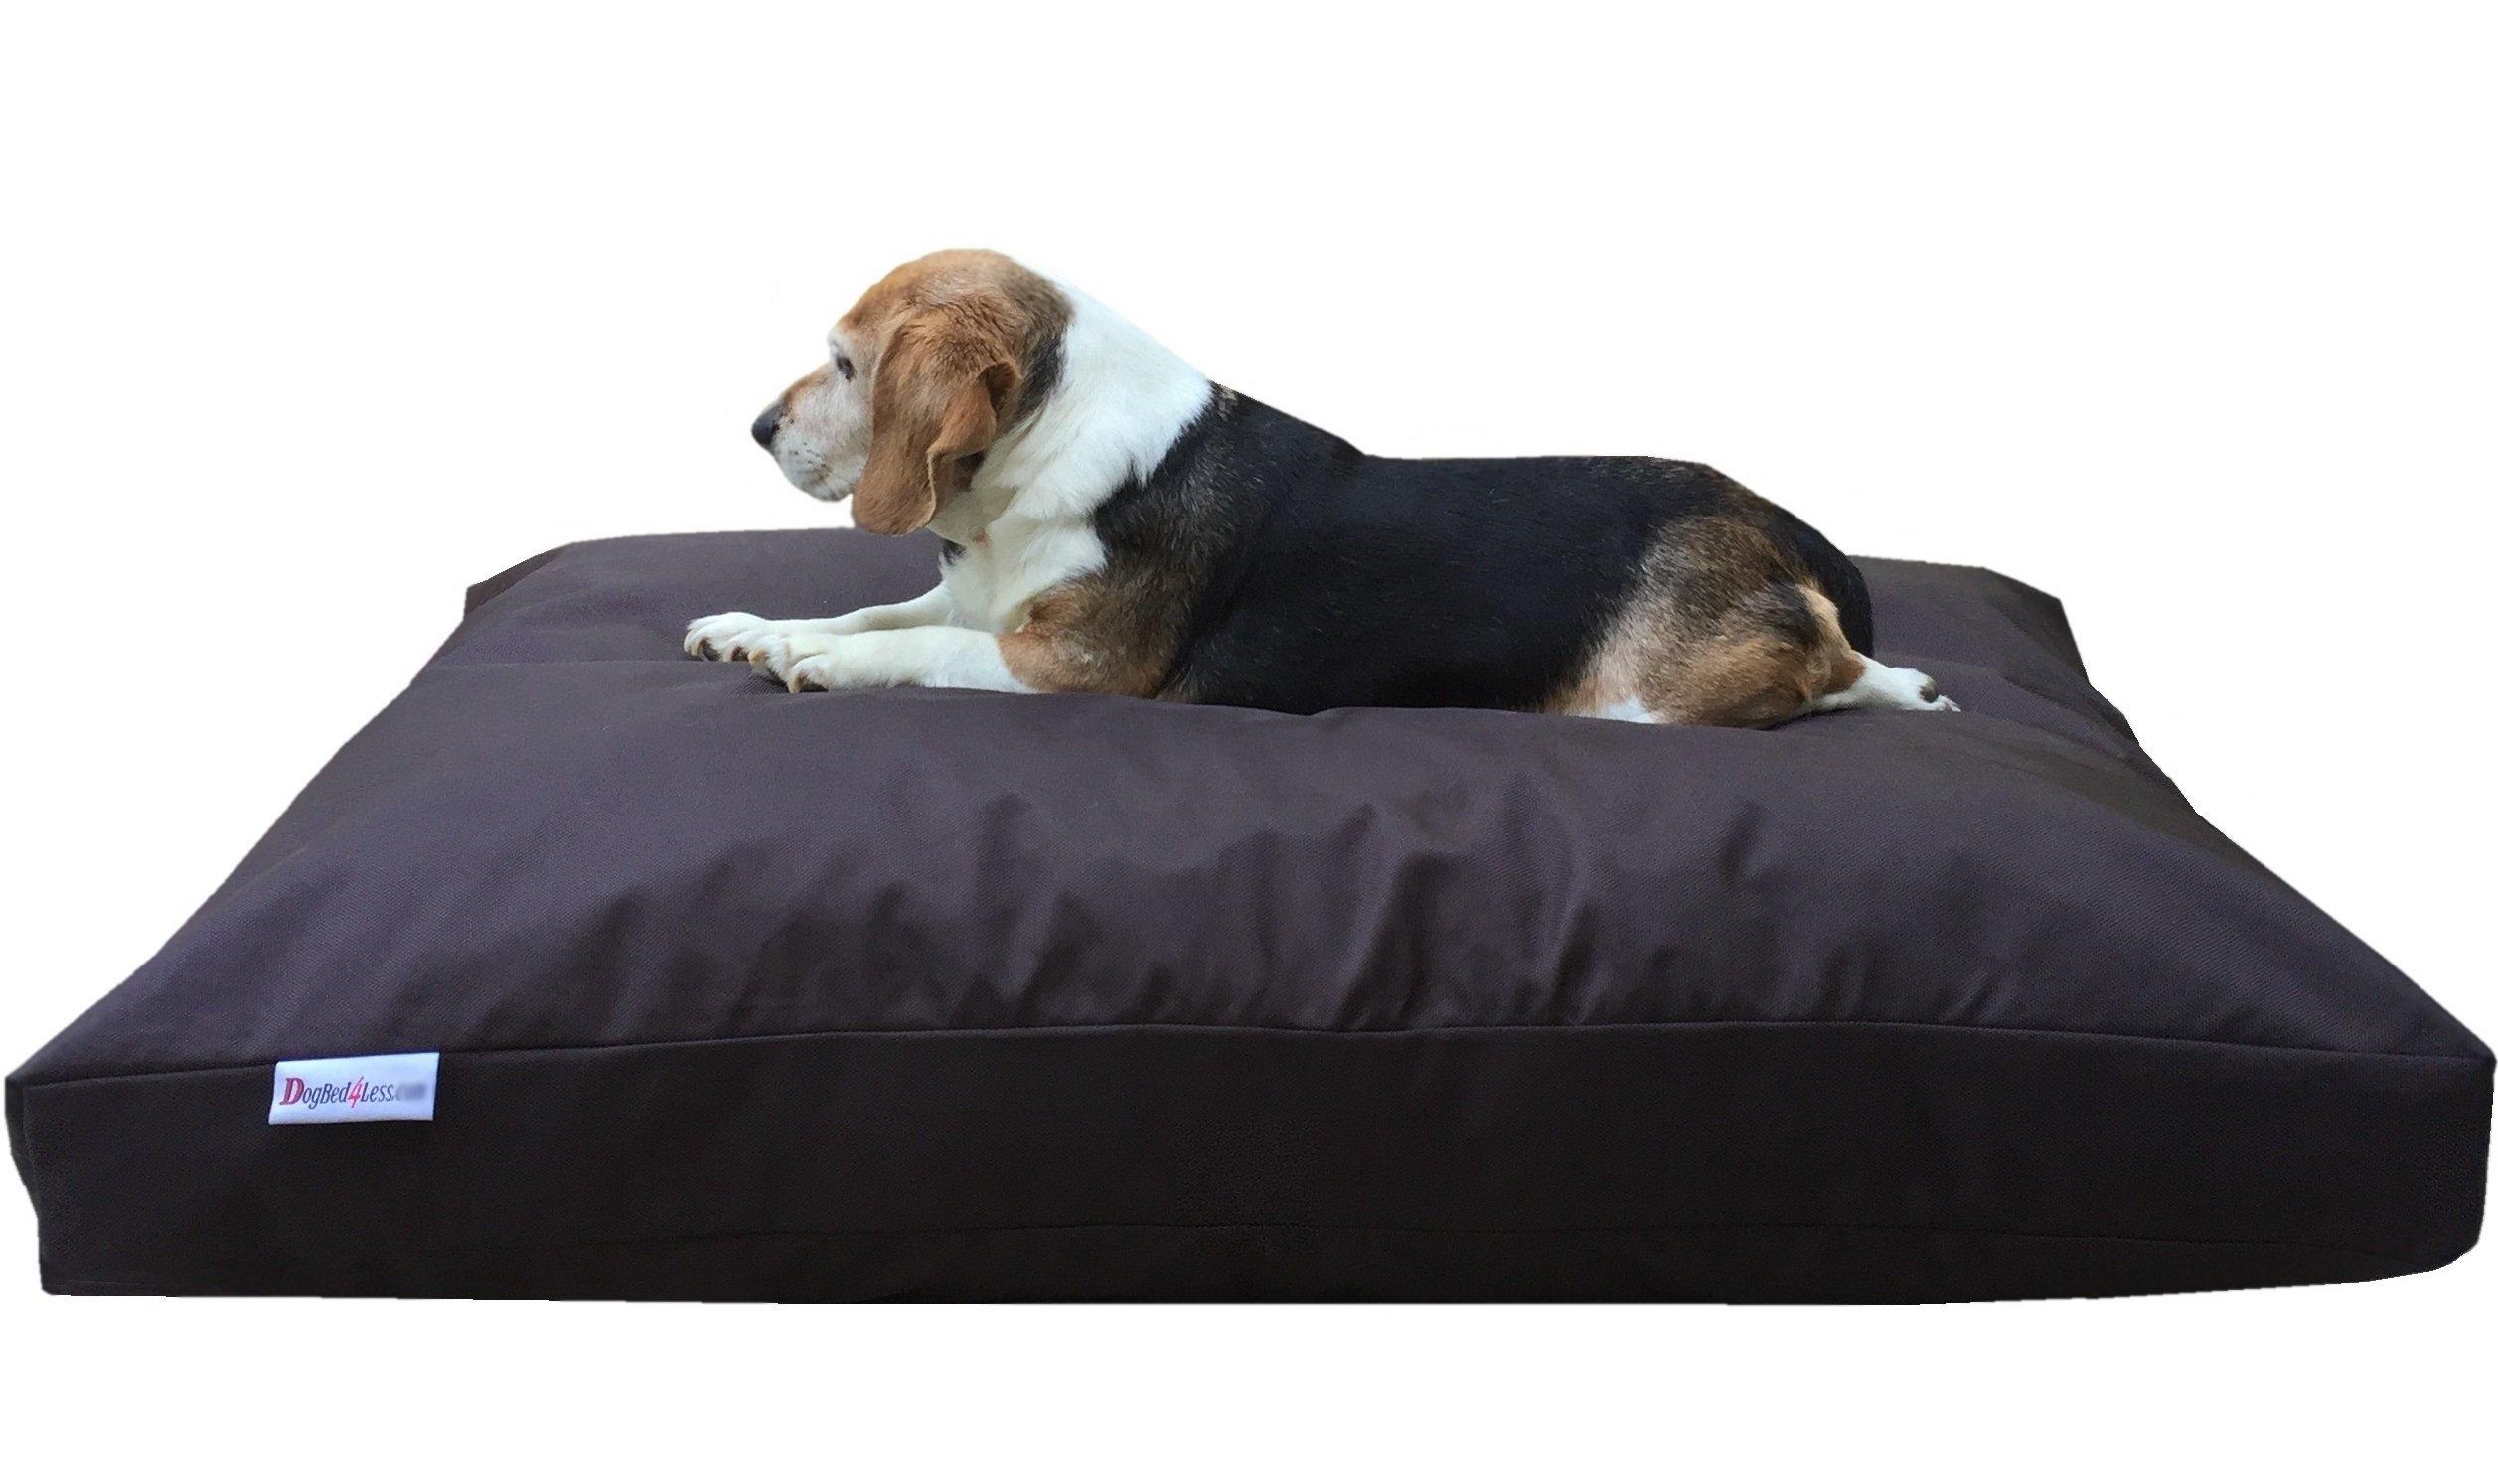 Best Value Memory Foam Dog Bed